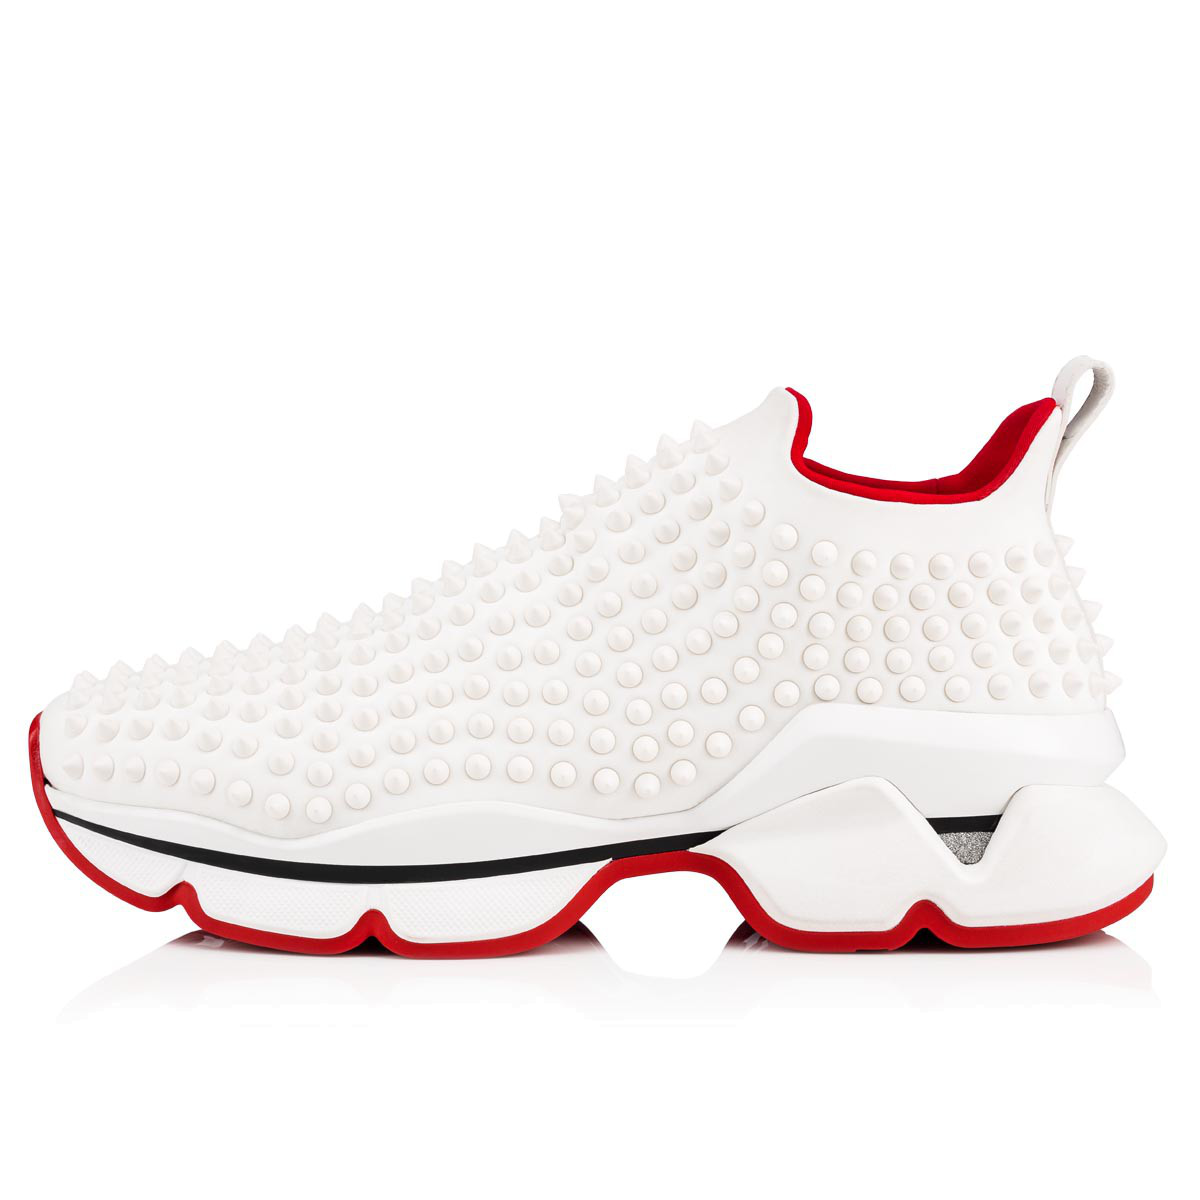 9c4a3007d0ed Christian Louboutin Spike-Embellished Neoprene Sock Trainers In White